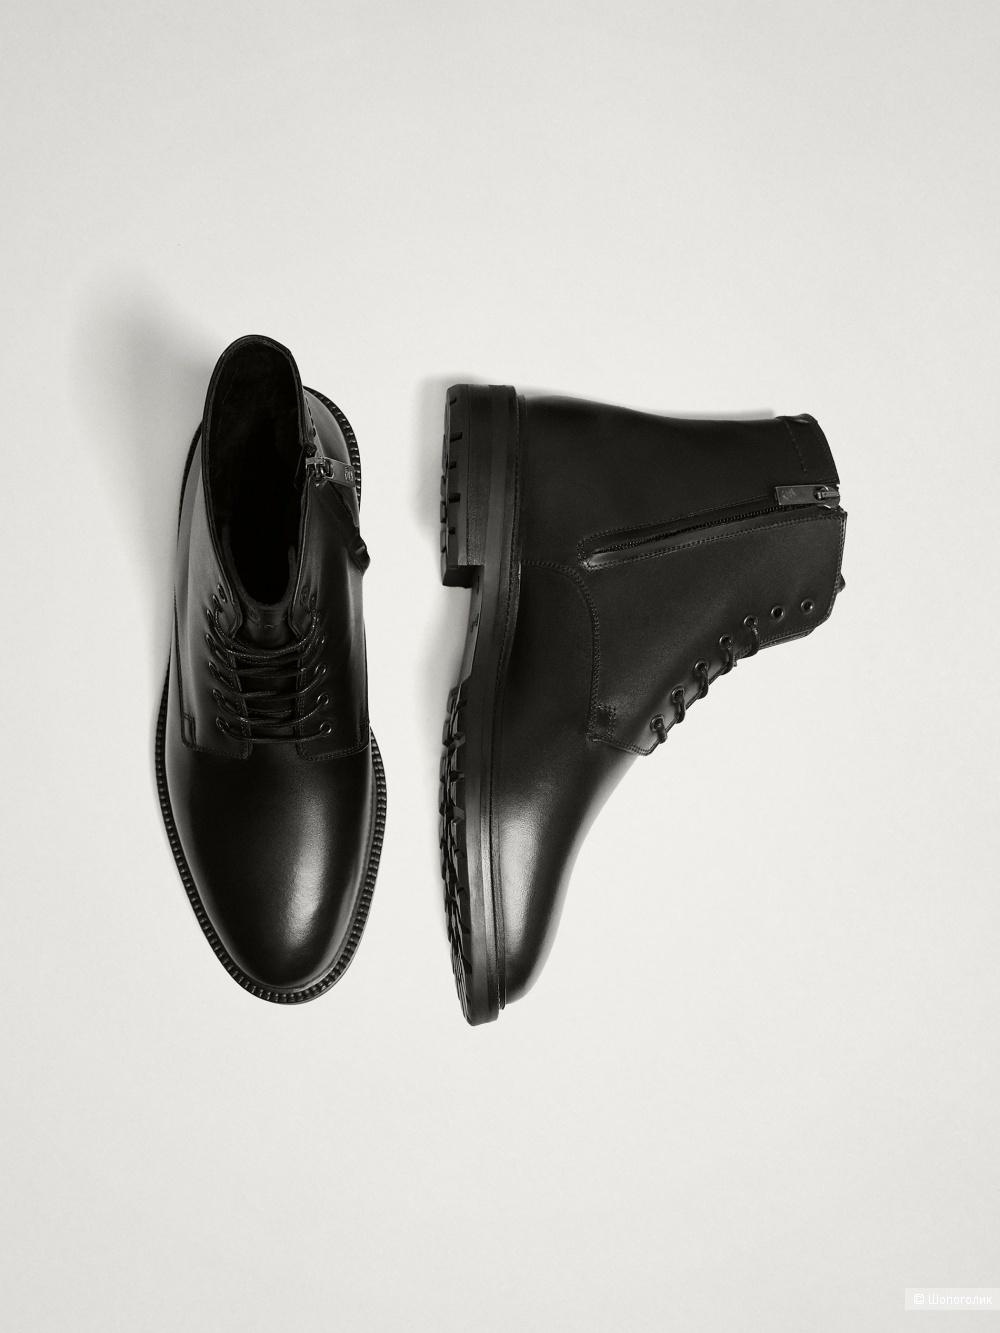 Мужские ботинки Massimo Dutti, на 40 - 40,5